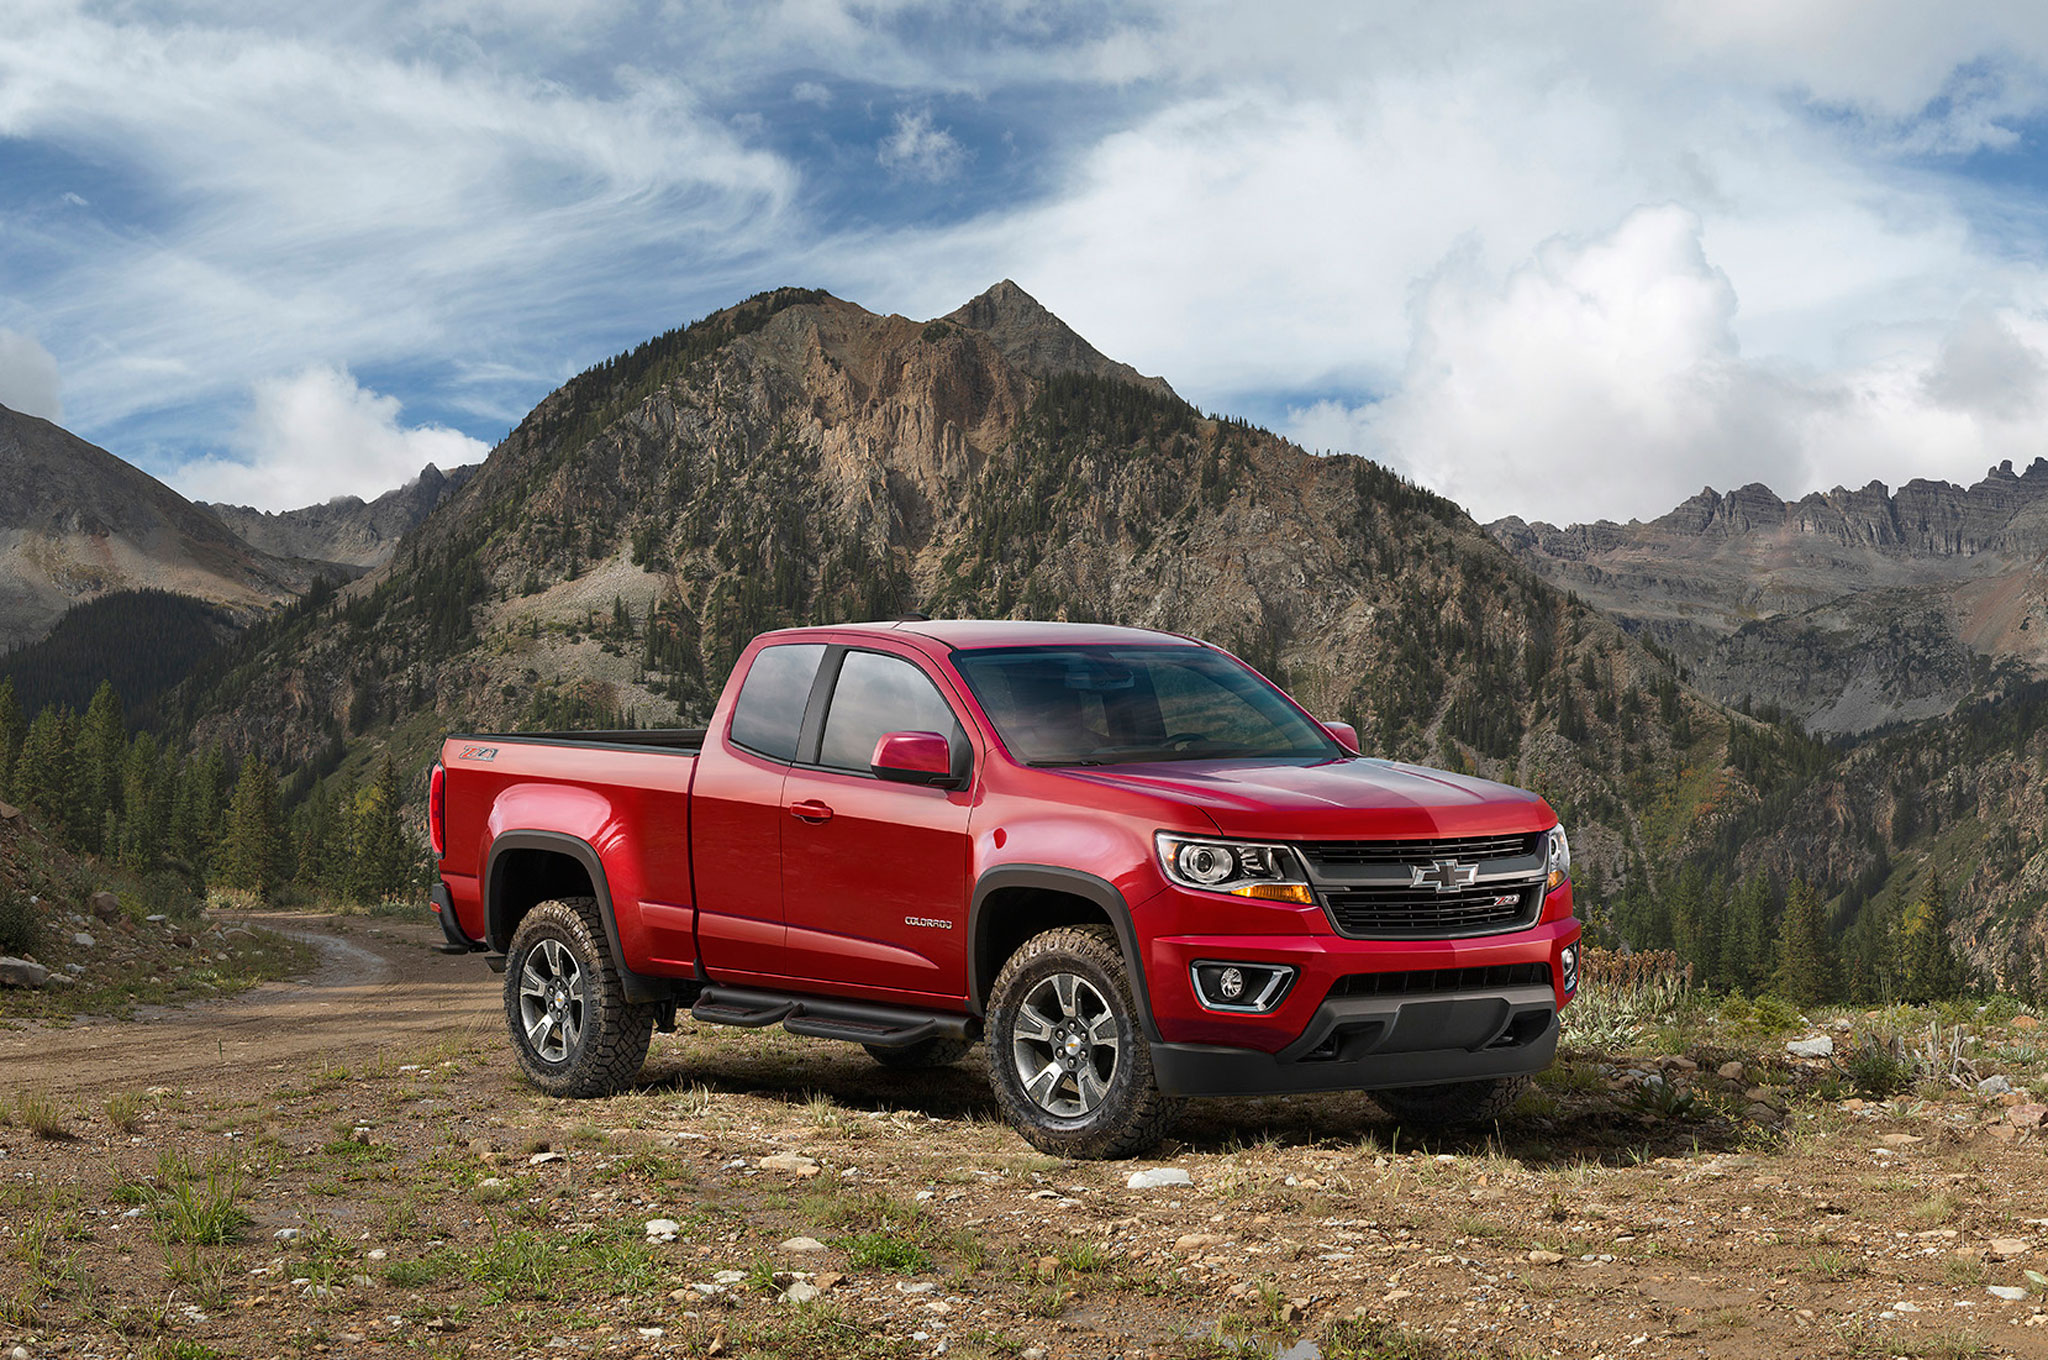 2015 Chevrolet Colorado Z71 Trail Boss Front Mountains1